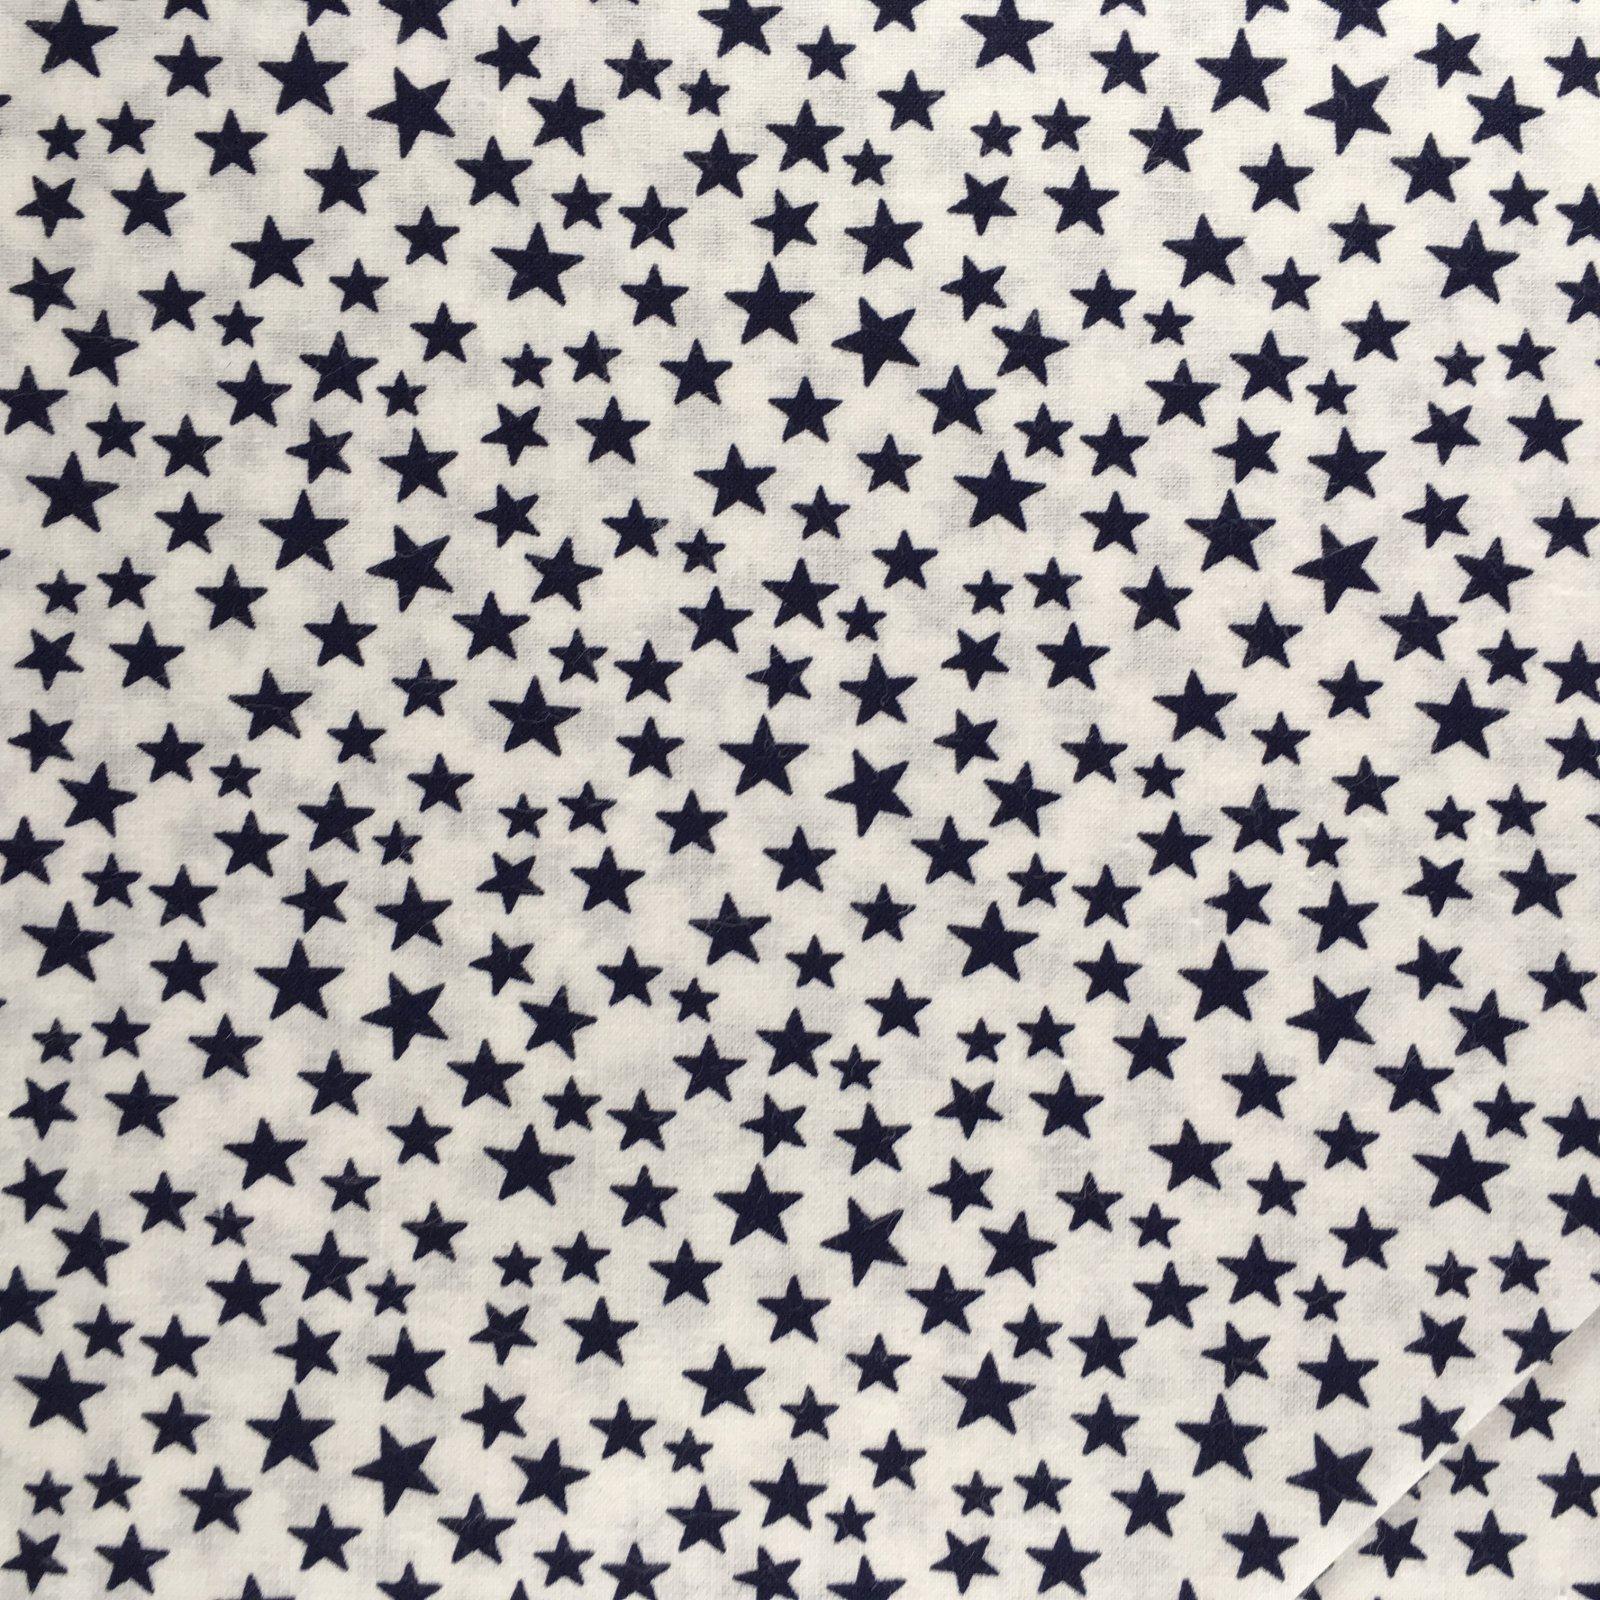 Choice Fabrics Patriotic Prints BD-48489-A01